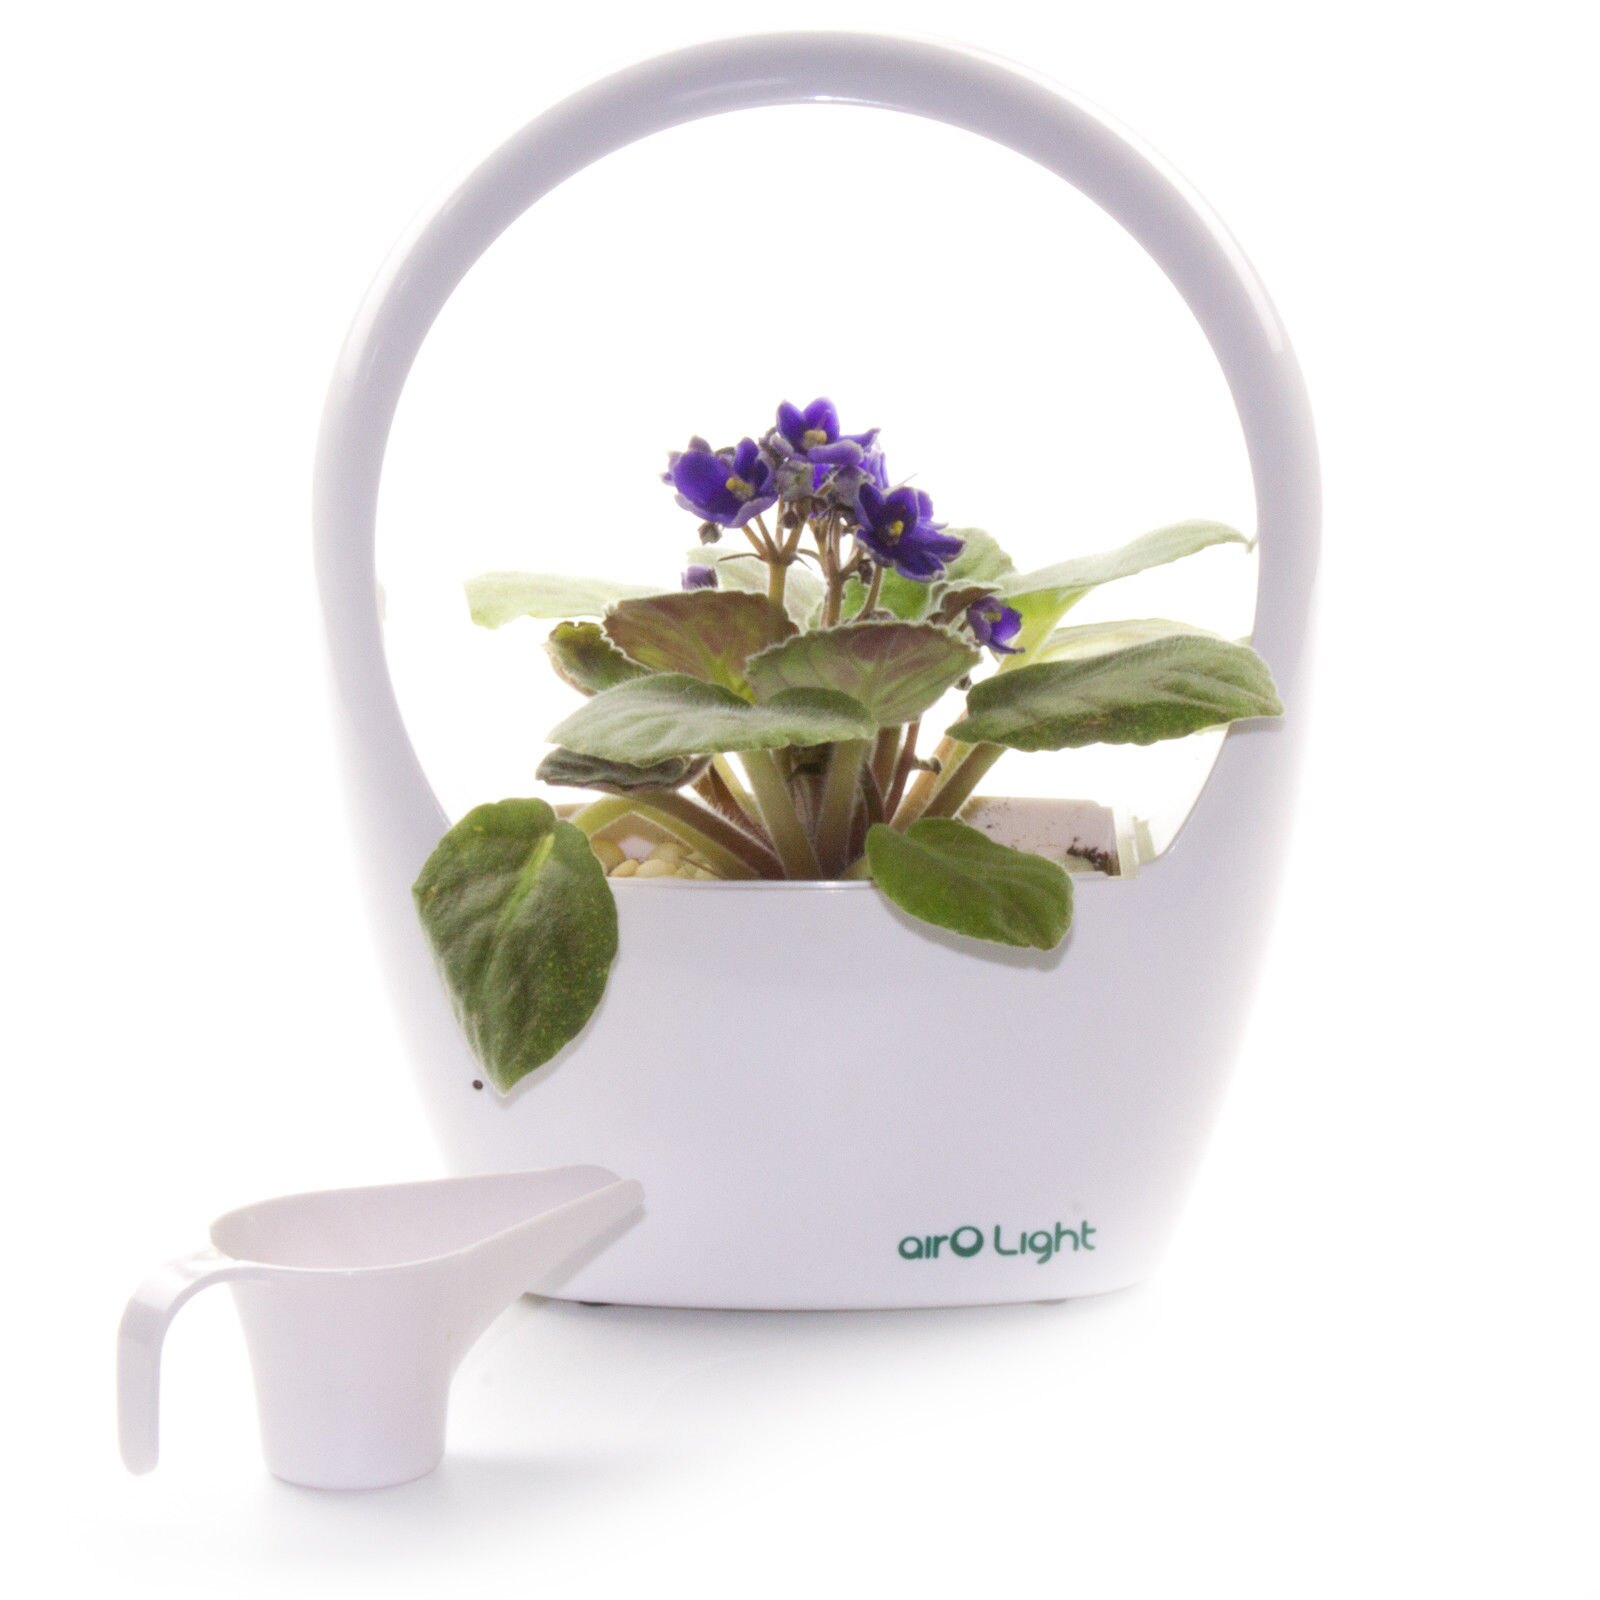 Ibot Led Plant Grow Light Kit Indoor Herb Garden Desktop Usb Lamp Greenhouse 0